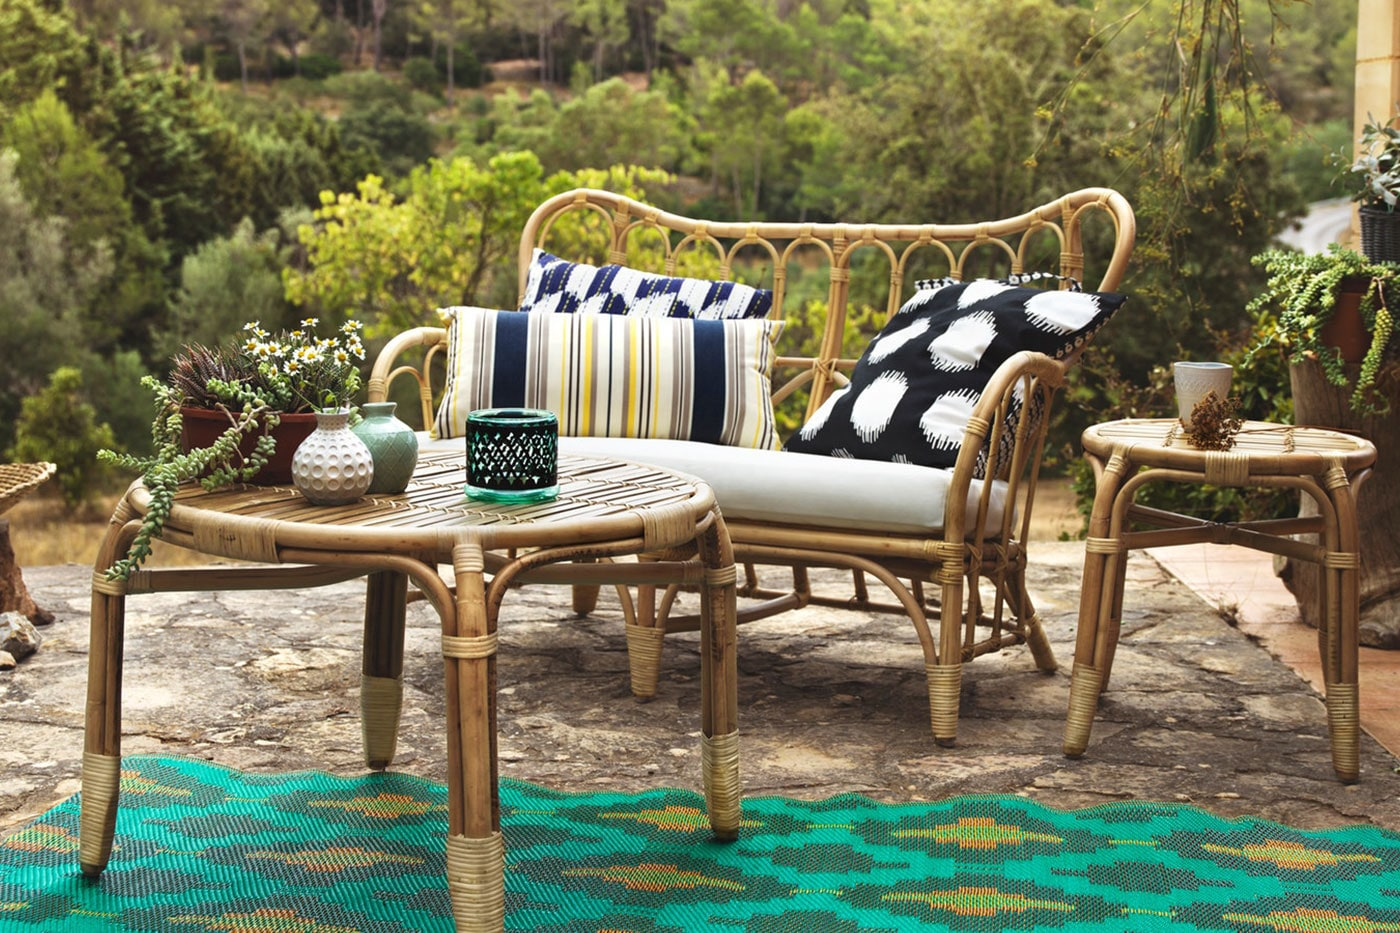 Outdoor furniture series - IKEA